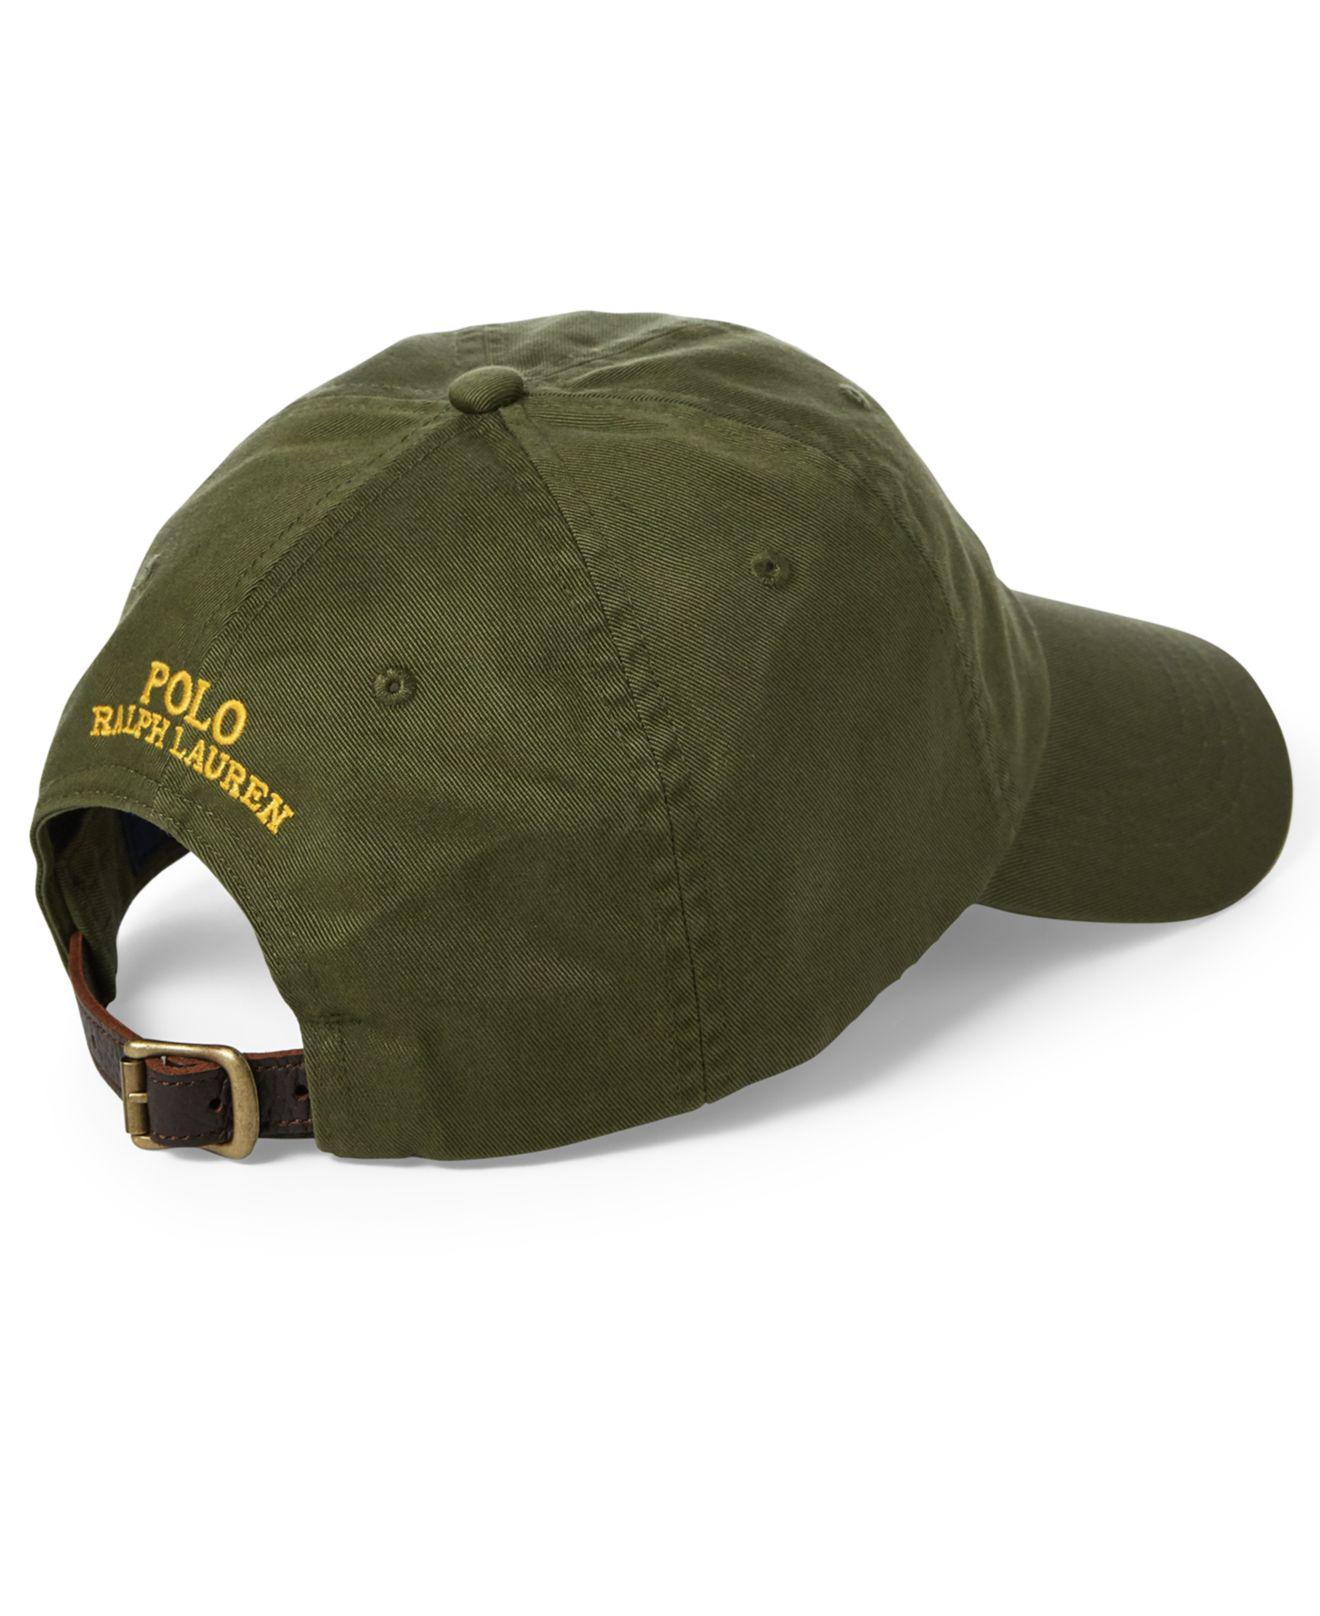 0f0ea16b5 Polo Ralph Lauren Great Outdoors Polo Bear Baseball Cap in Green for ...